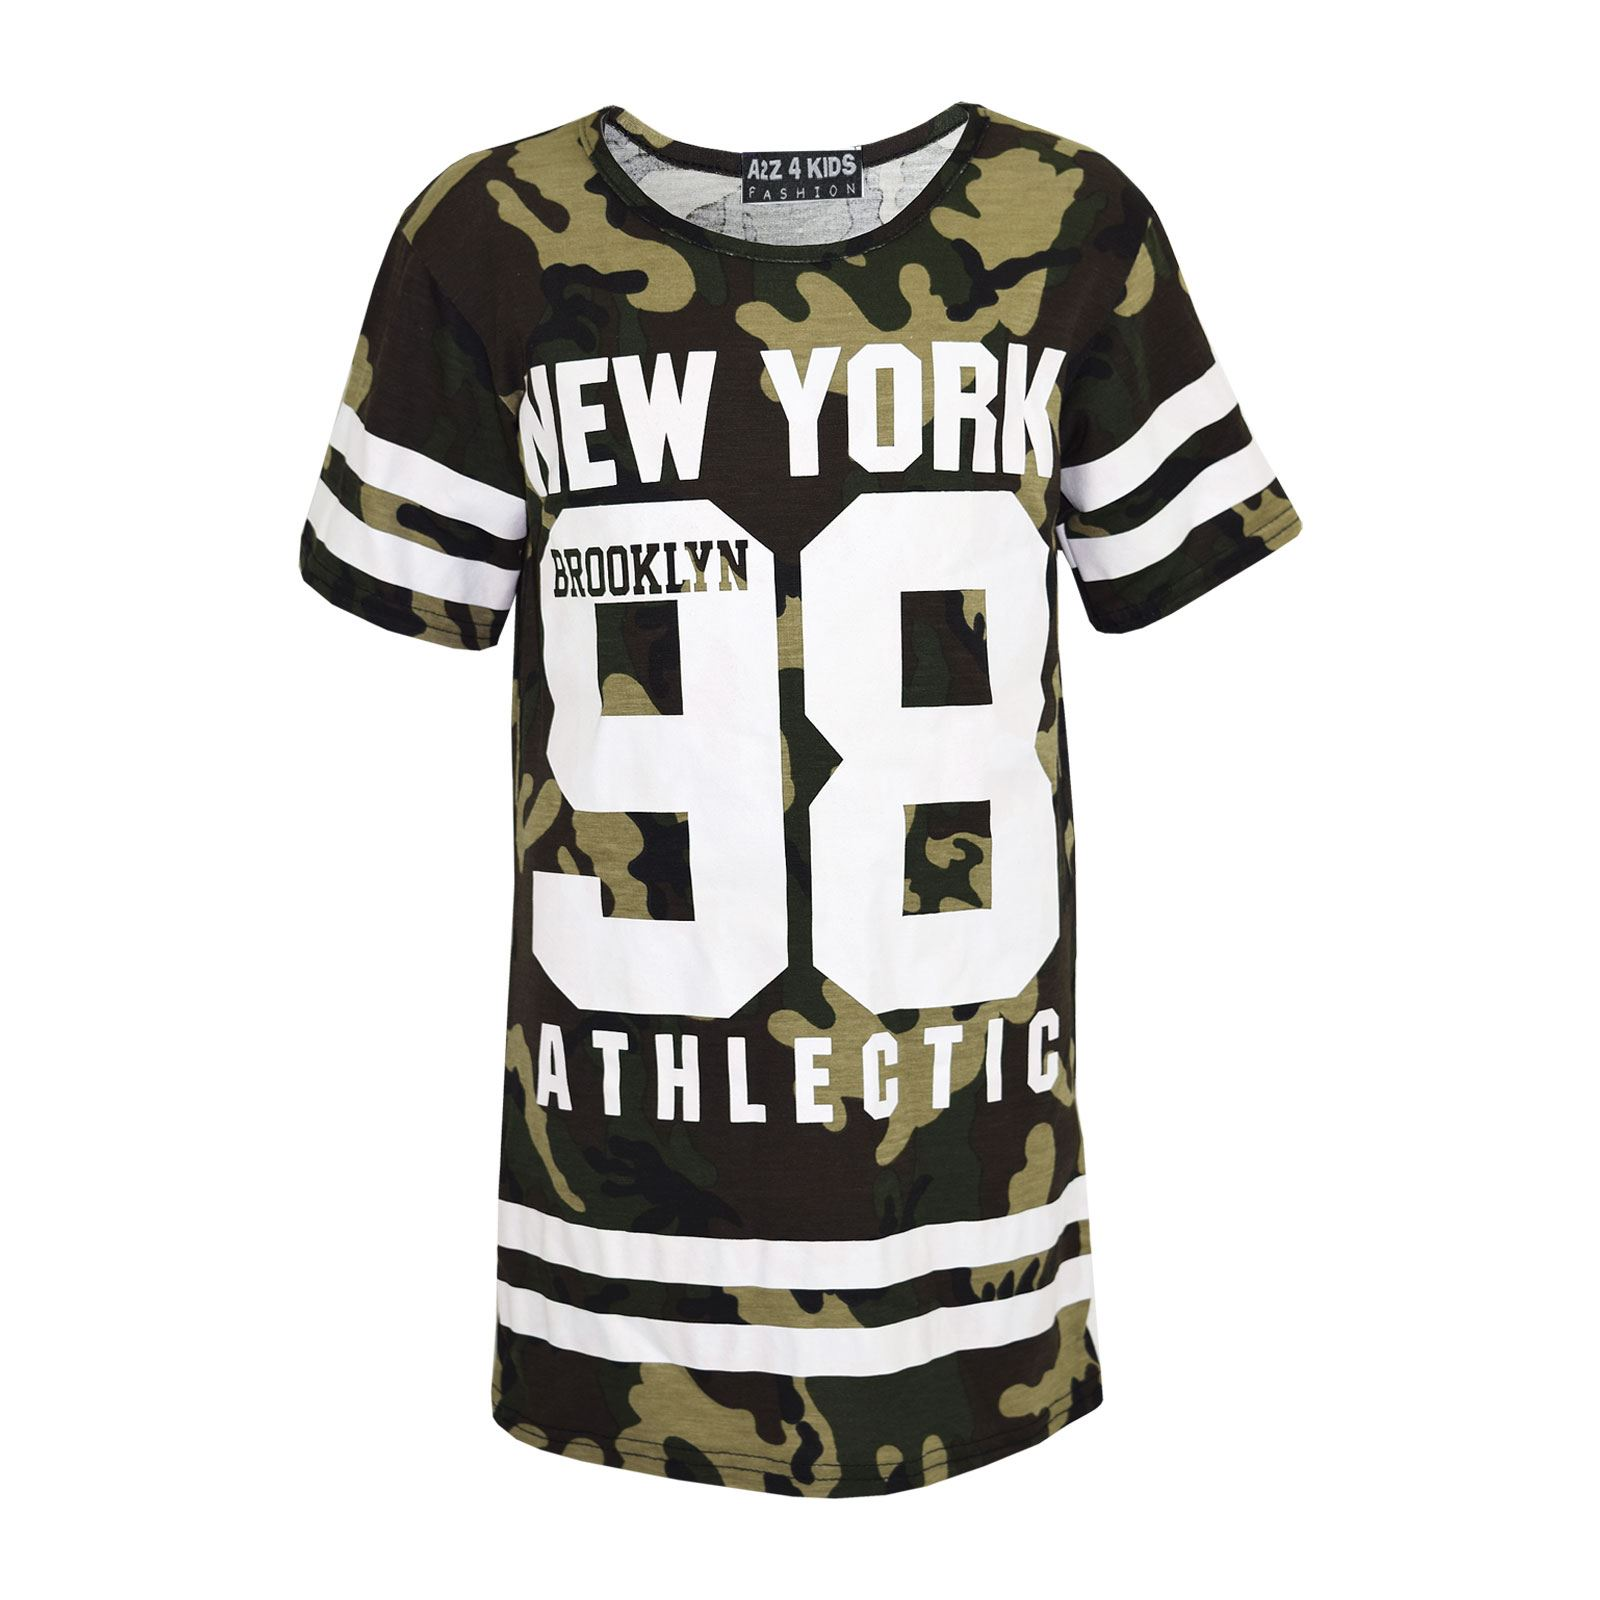 Girls-NEW-YORK-BROOKLYN-98-ATHLECTIC-Camouflage-Print-Top-amp-Legging-Set-7-13-Yr thumbnail 21